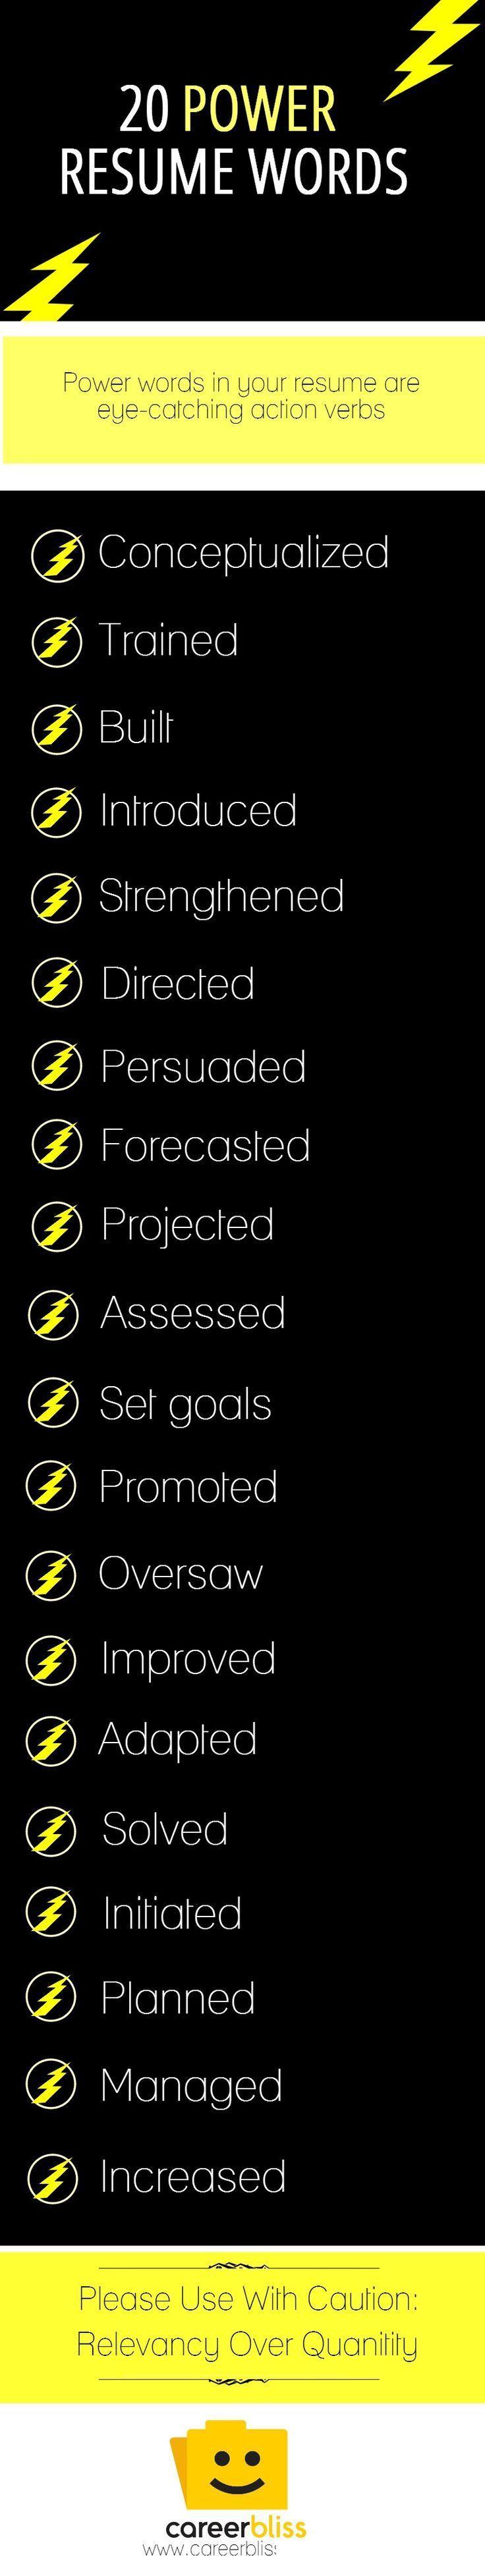 20 Resume Power Words (quality over quantity)